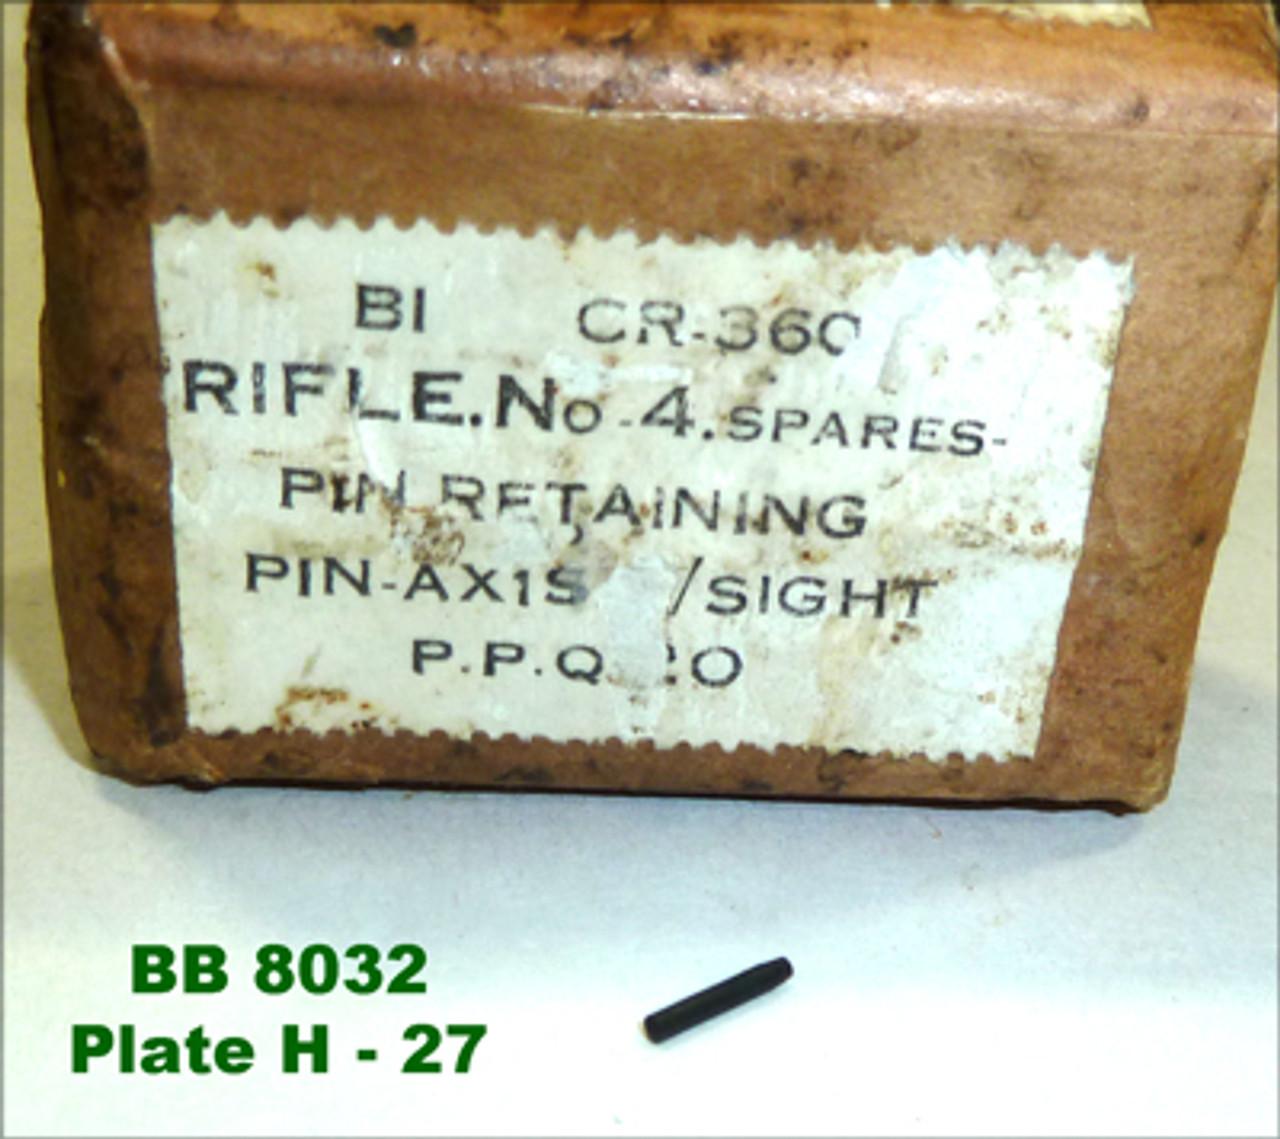 52:  PIN, retaining, pin, axis, rear sight (NOS)